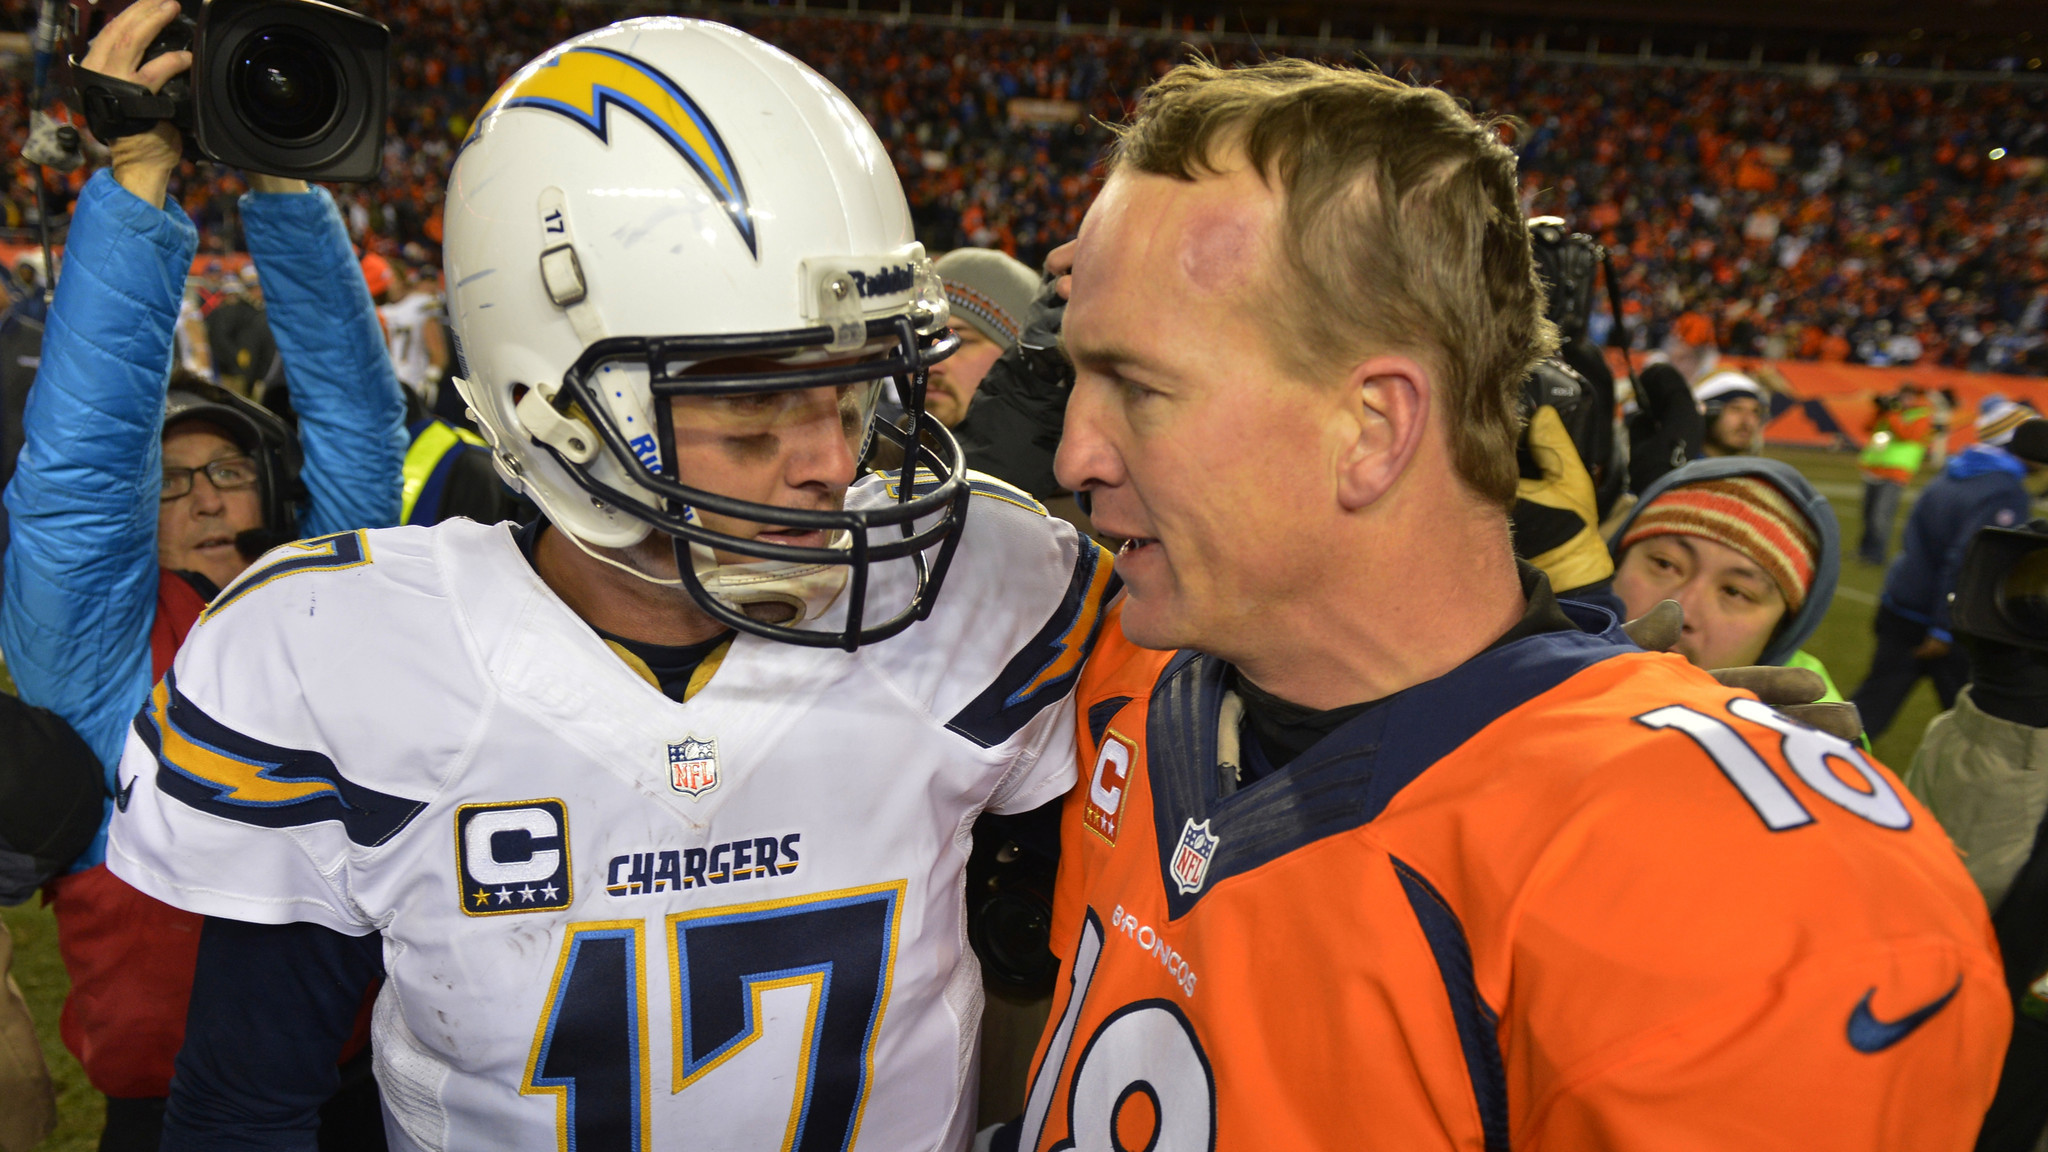 NFL tonight: San Diego at Denver